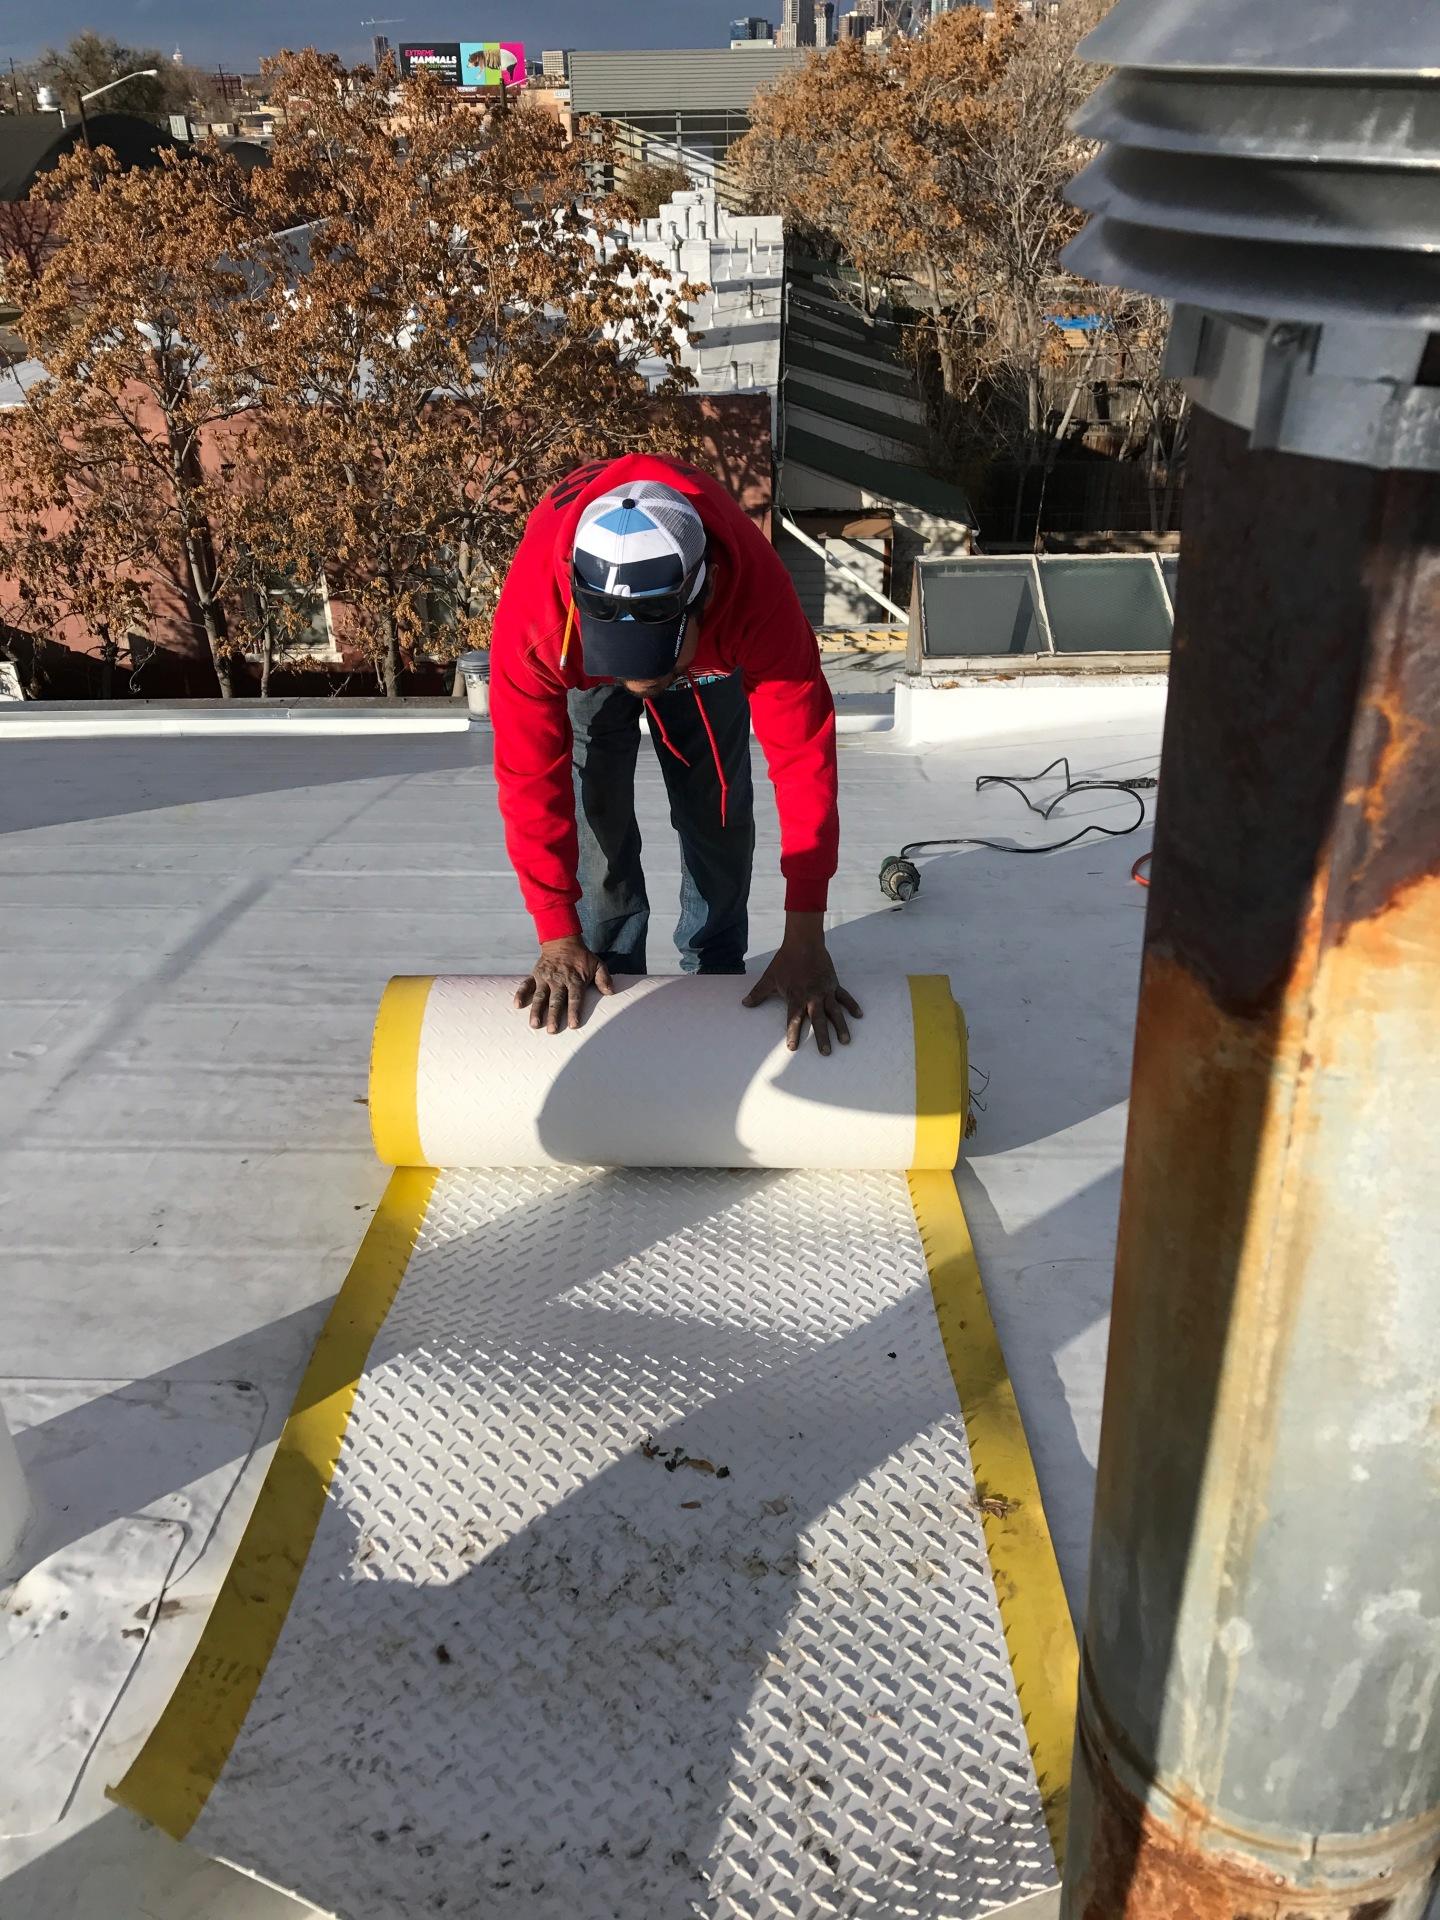 Installing TPO walk pad for slip resistance